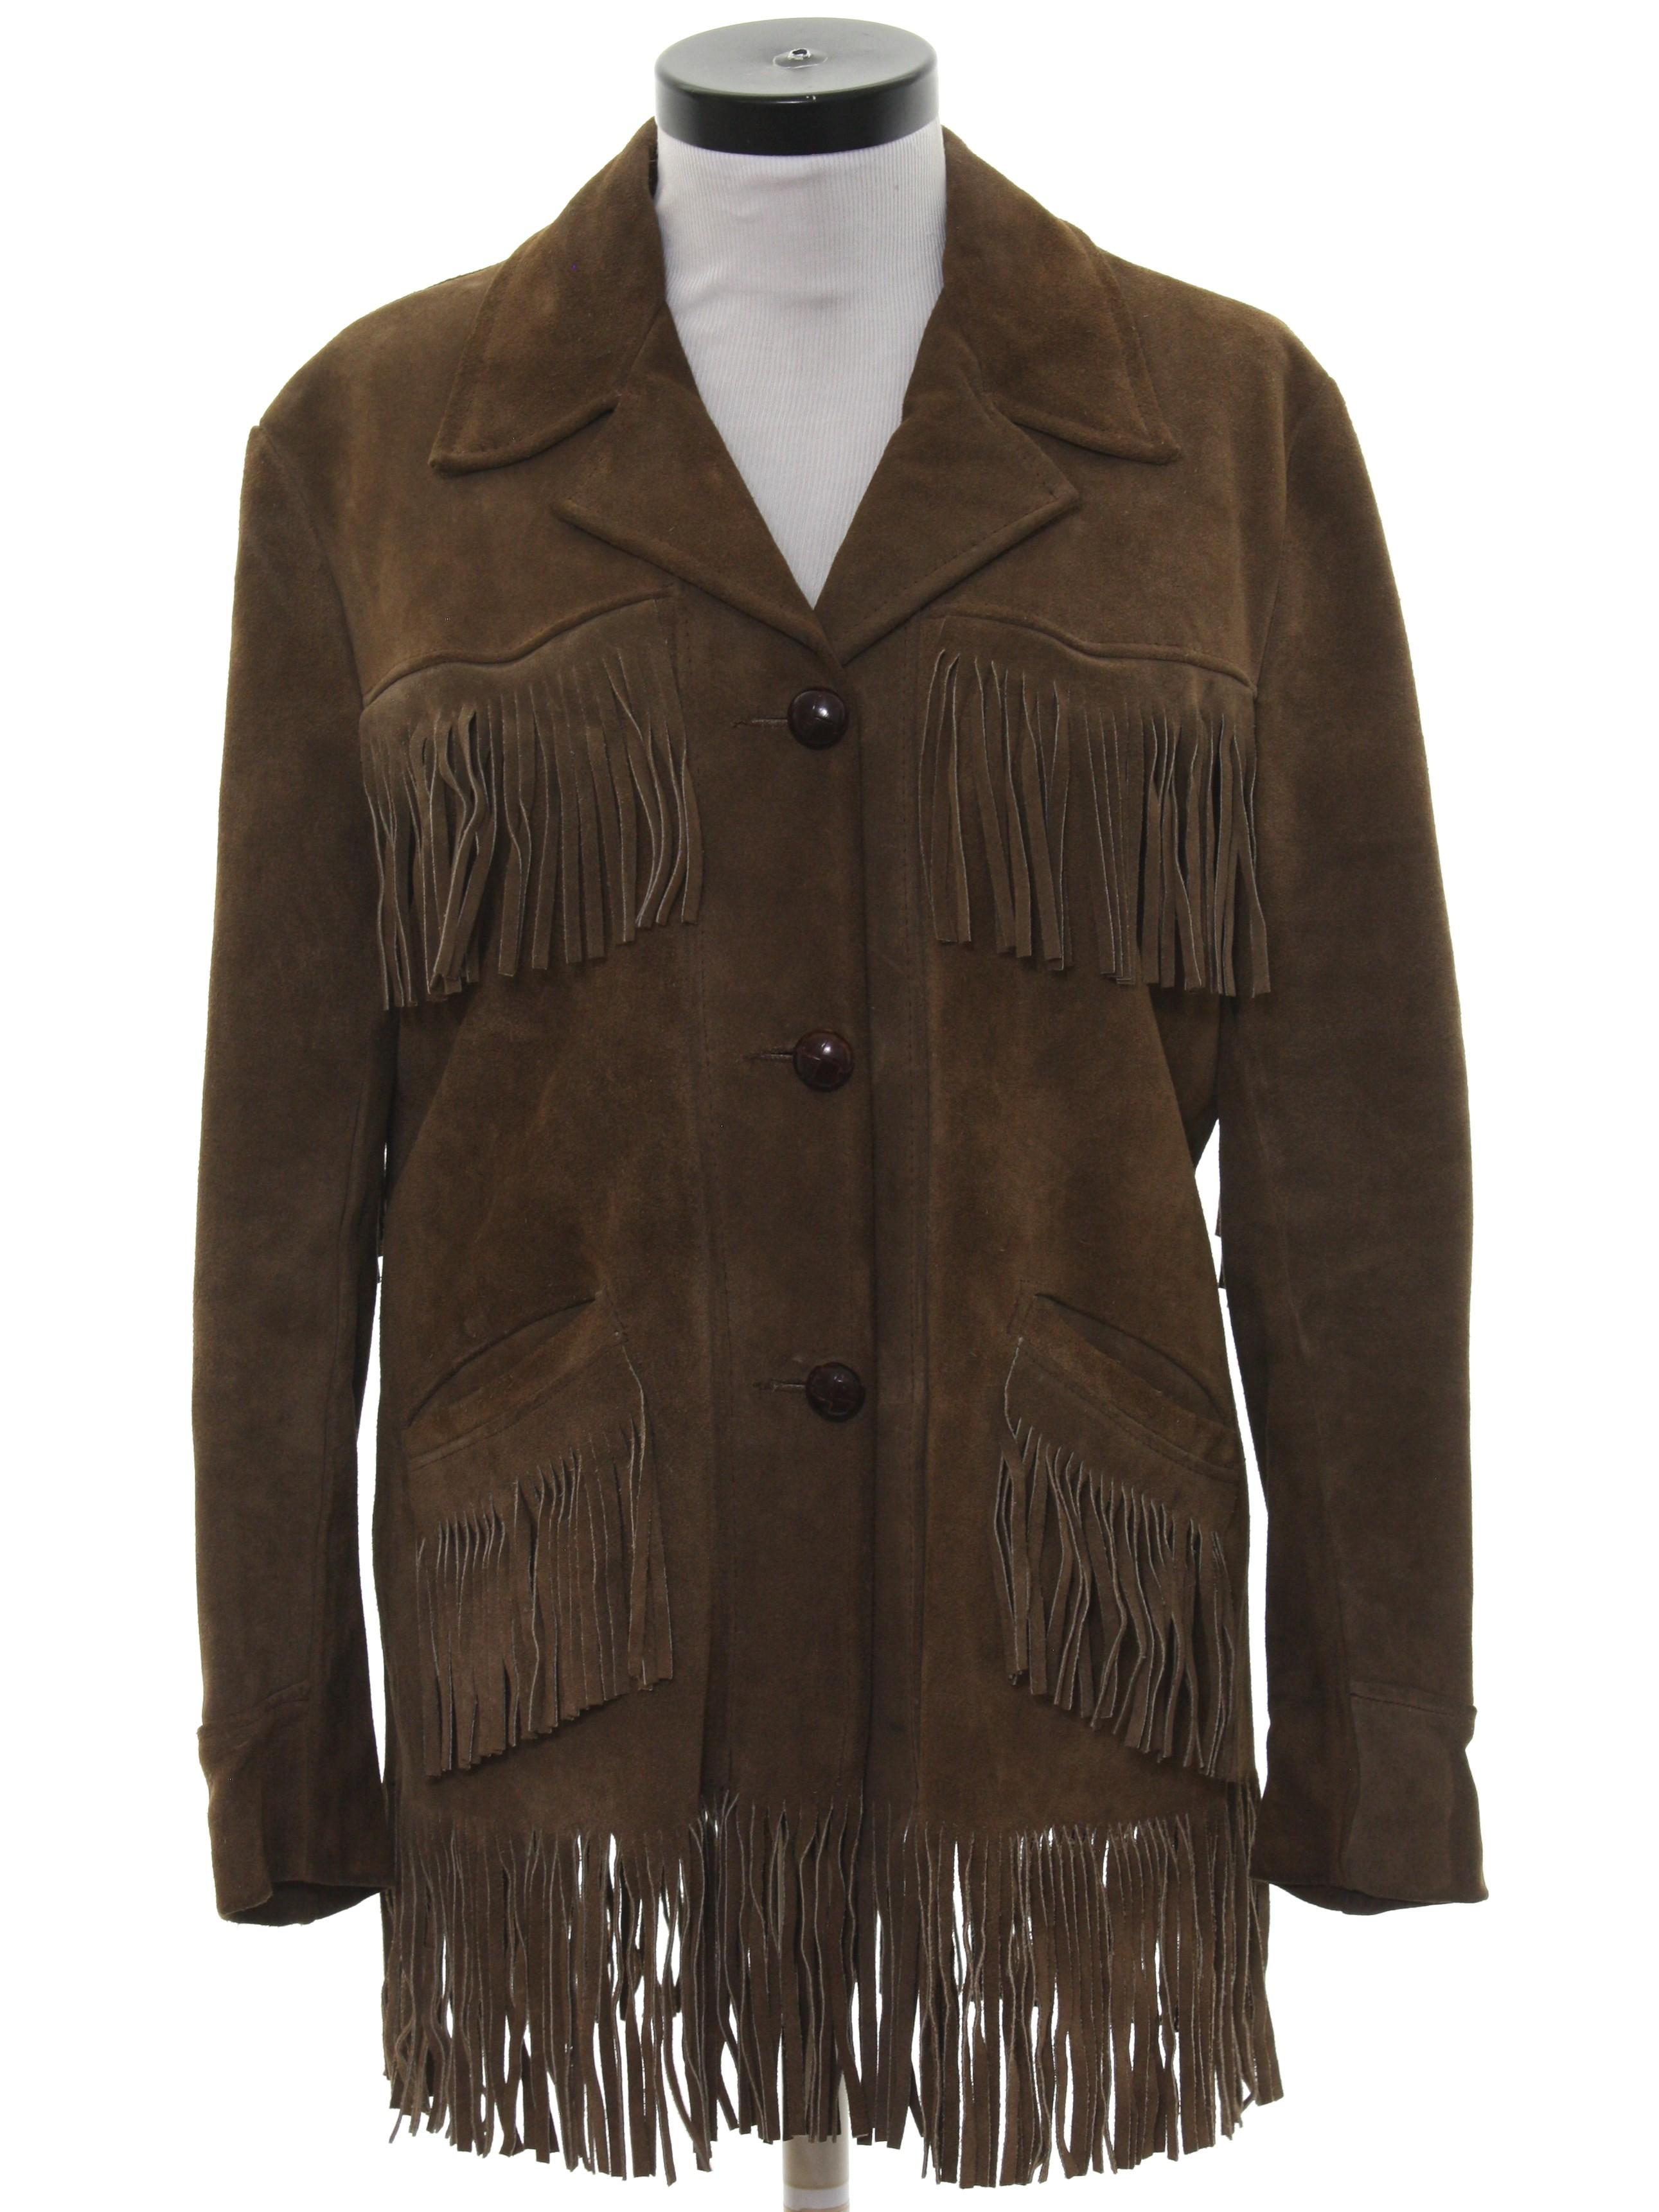 3dcbad641 1970's Sears Western Wear Womens Fringed Hippie Western Suede Leather Jacket